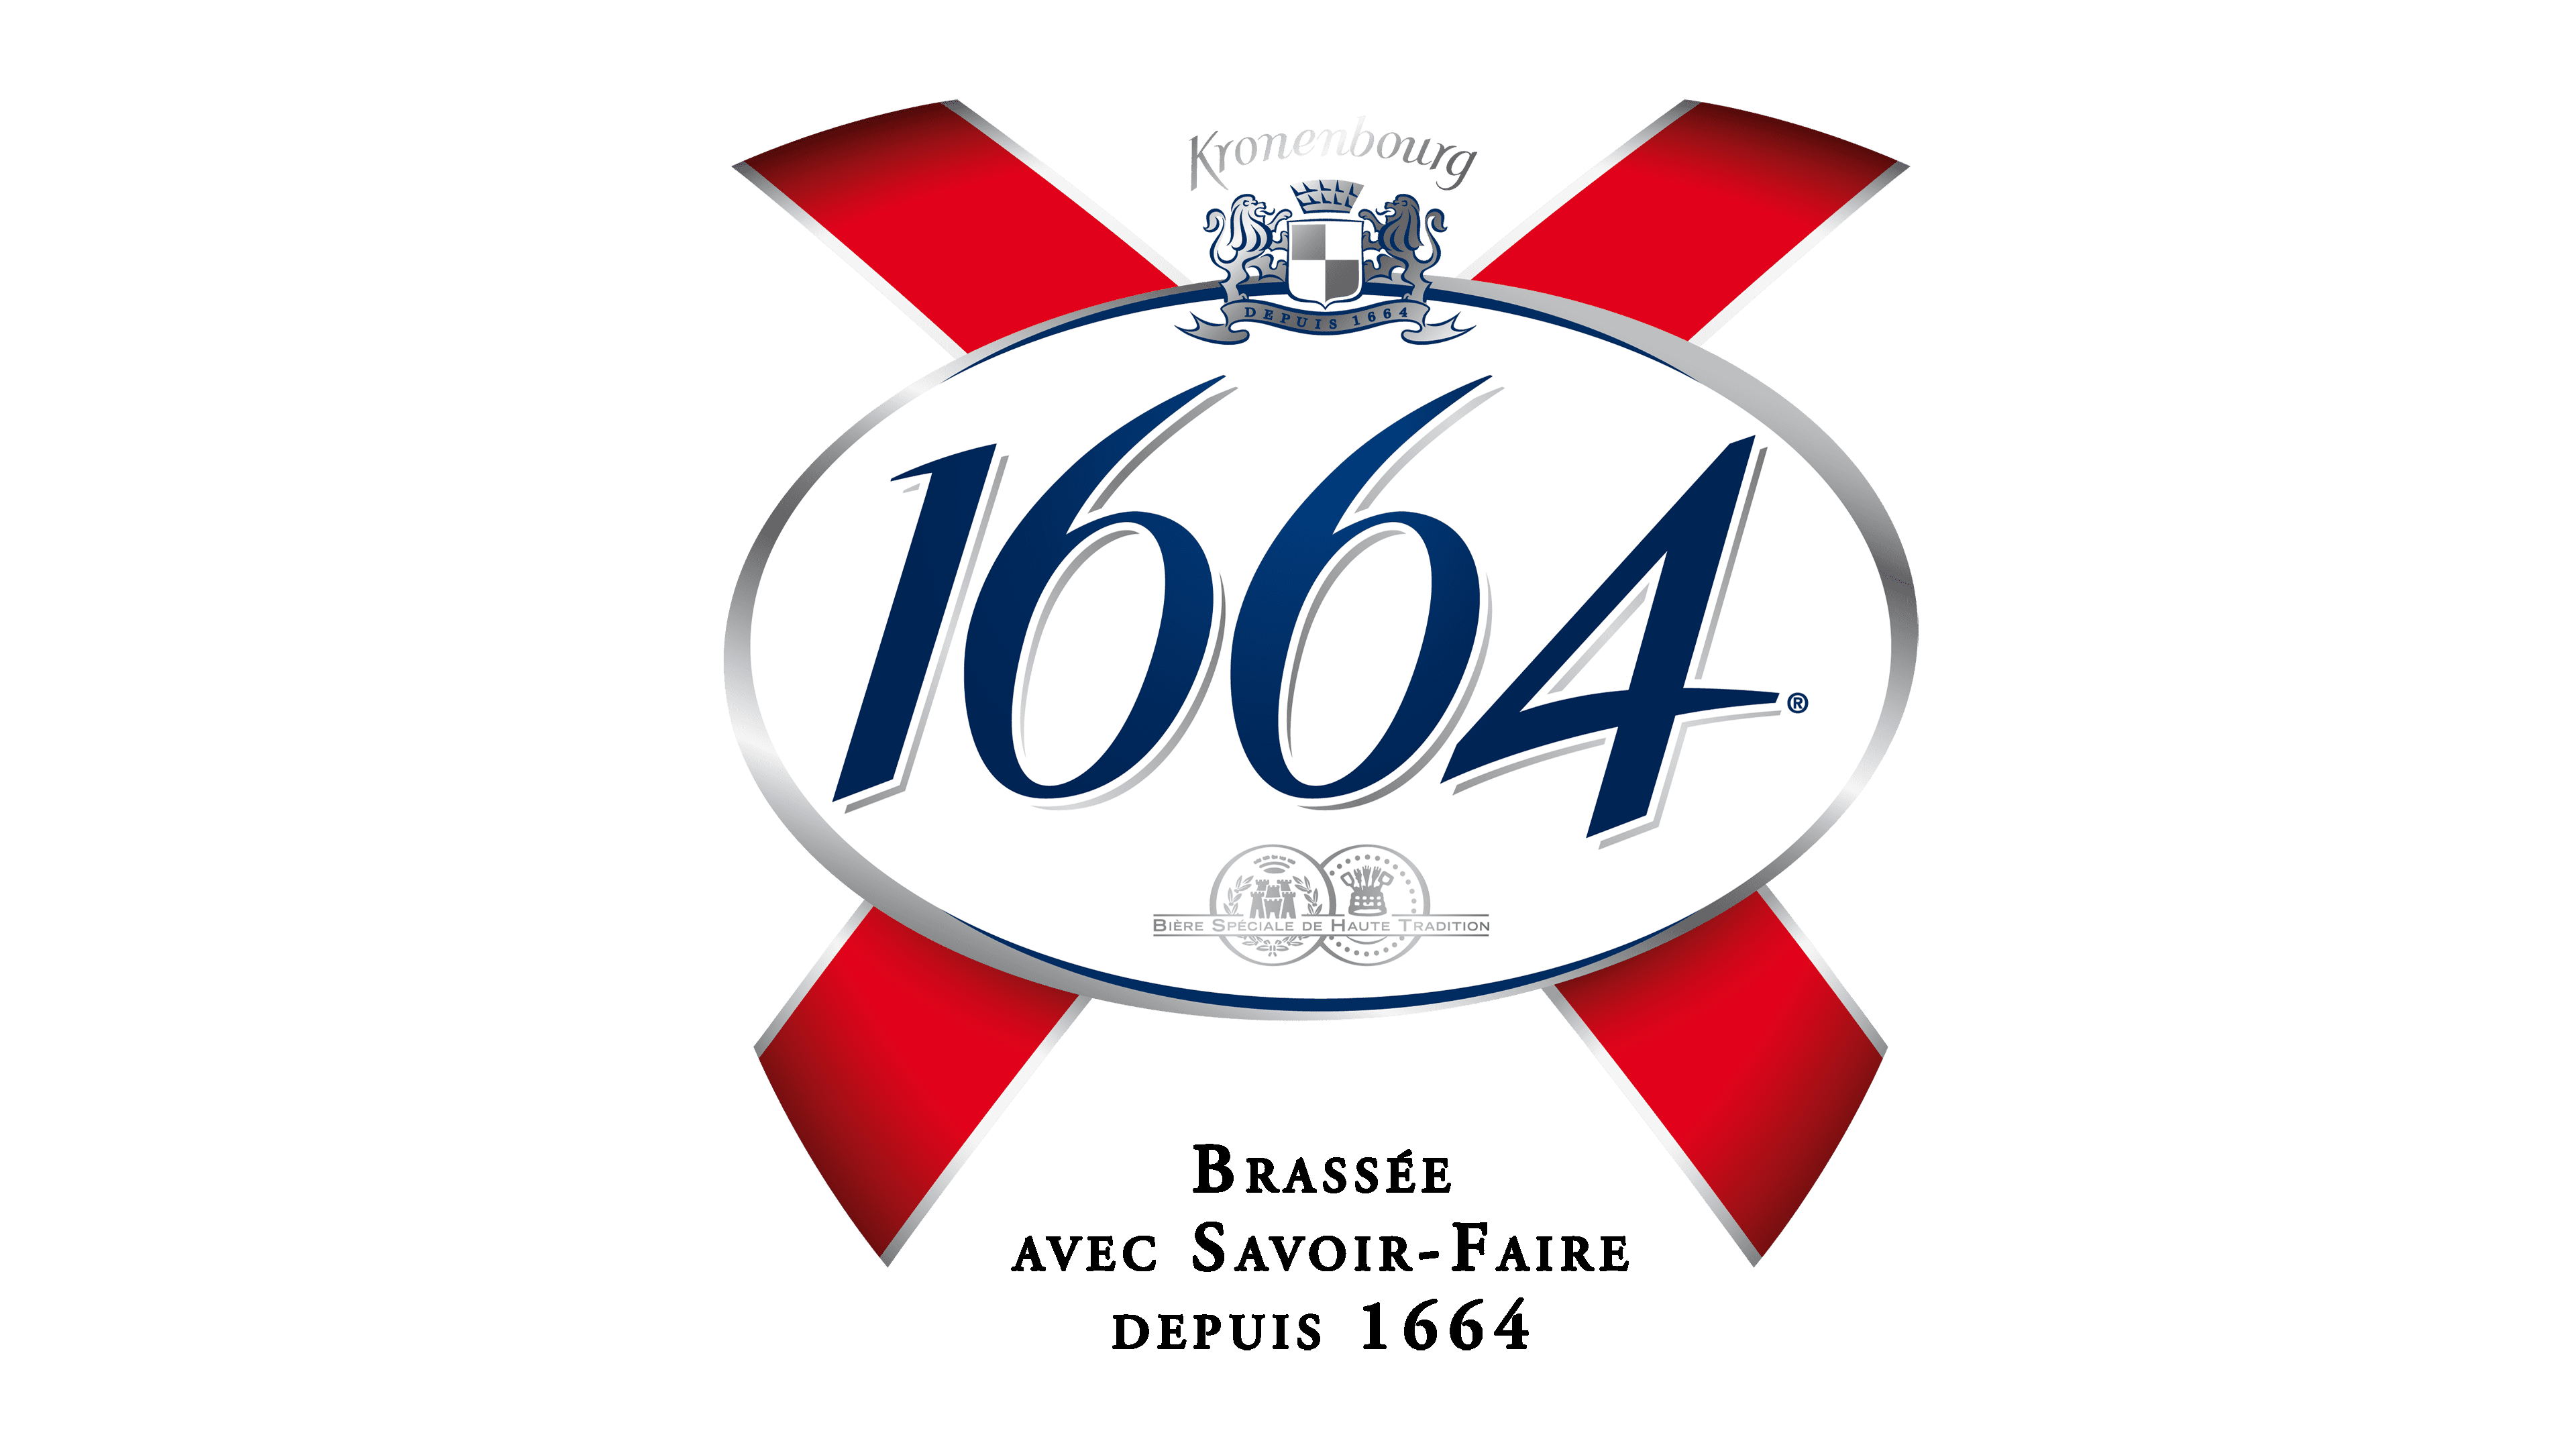 Kronenbourg 1664 Logo Logo